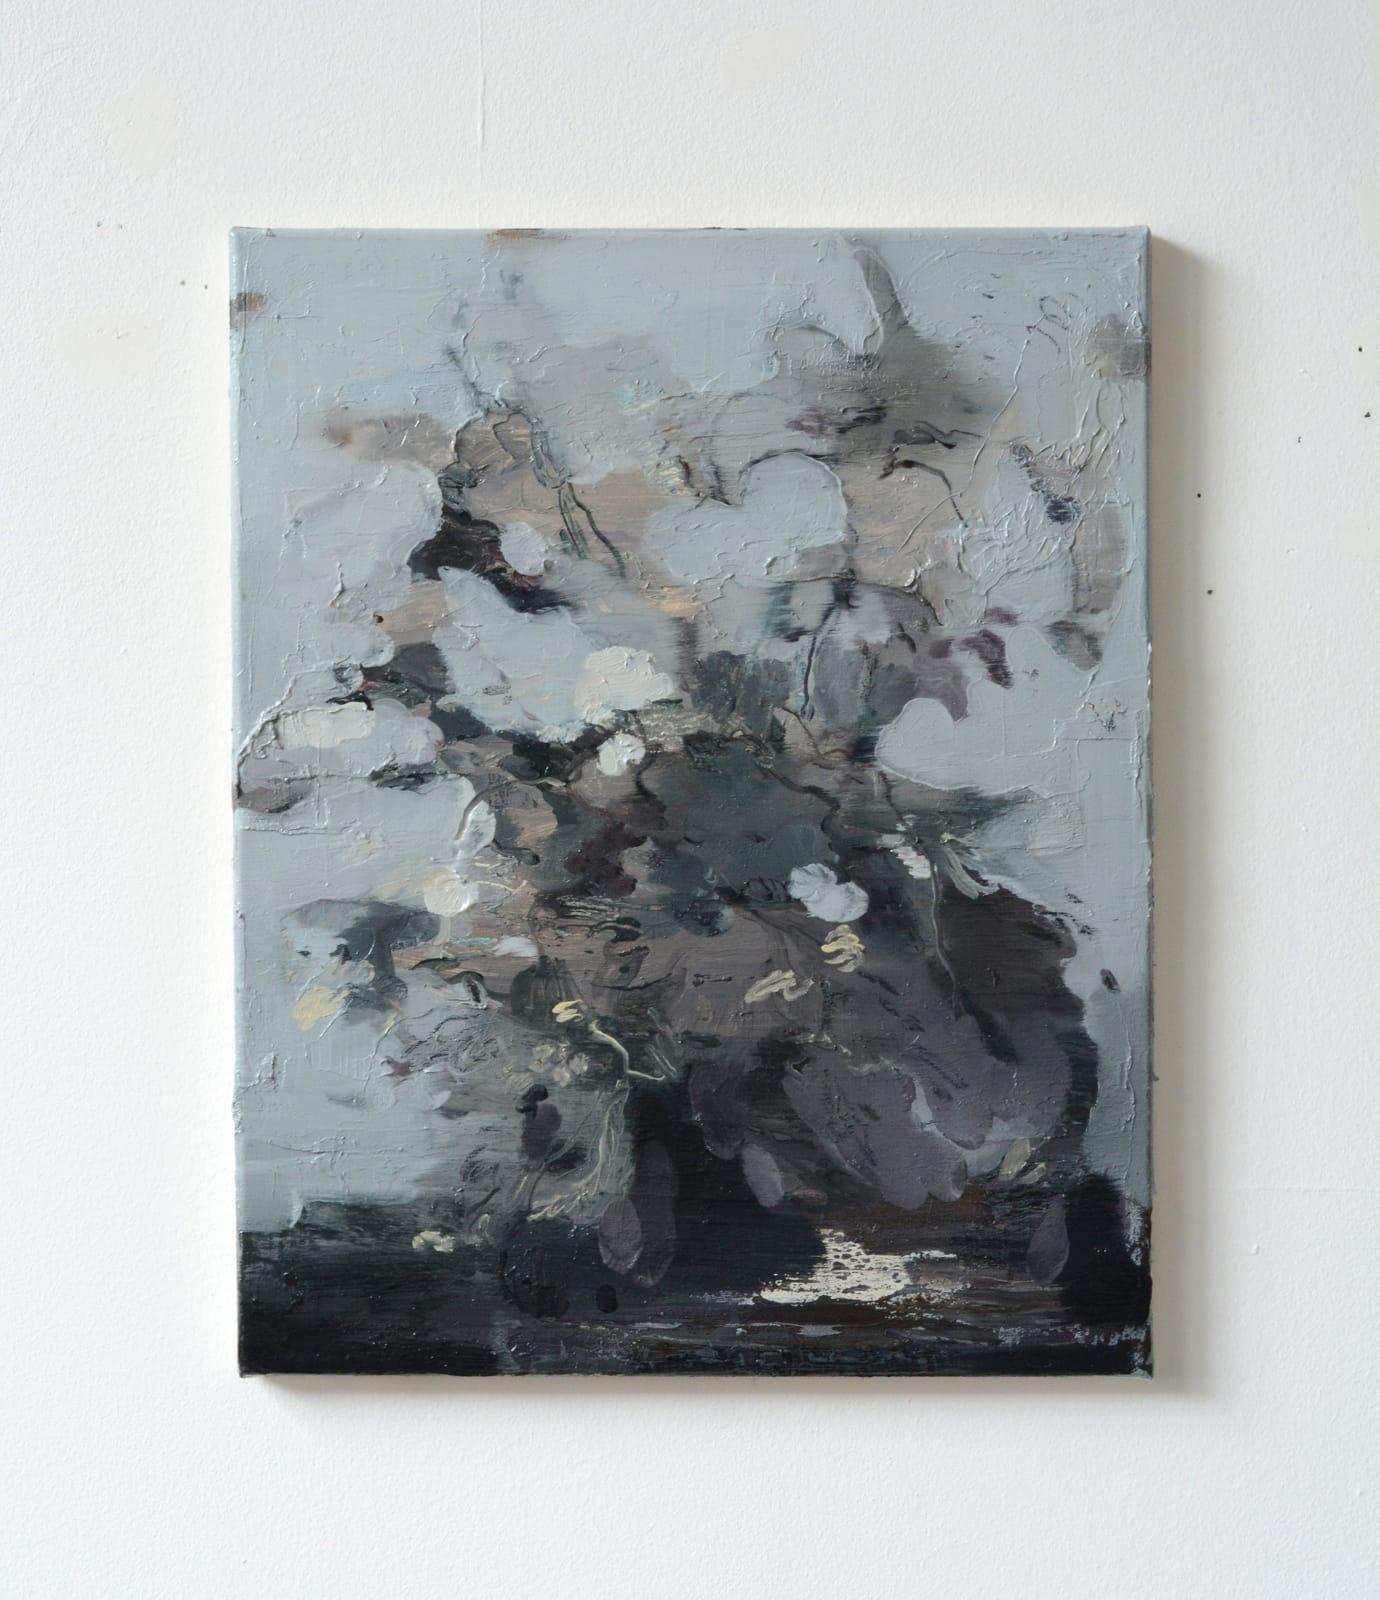 19. Nazzarena Poli Maramotti, oil on canvas, 40x50cm, 2018